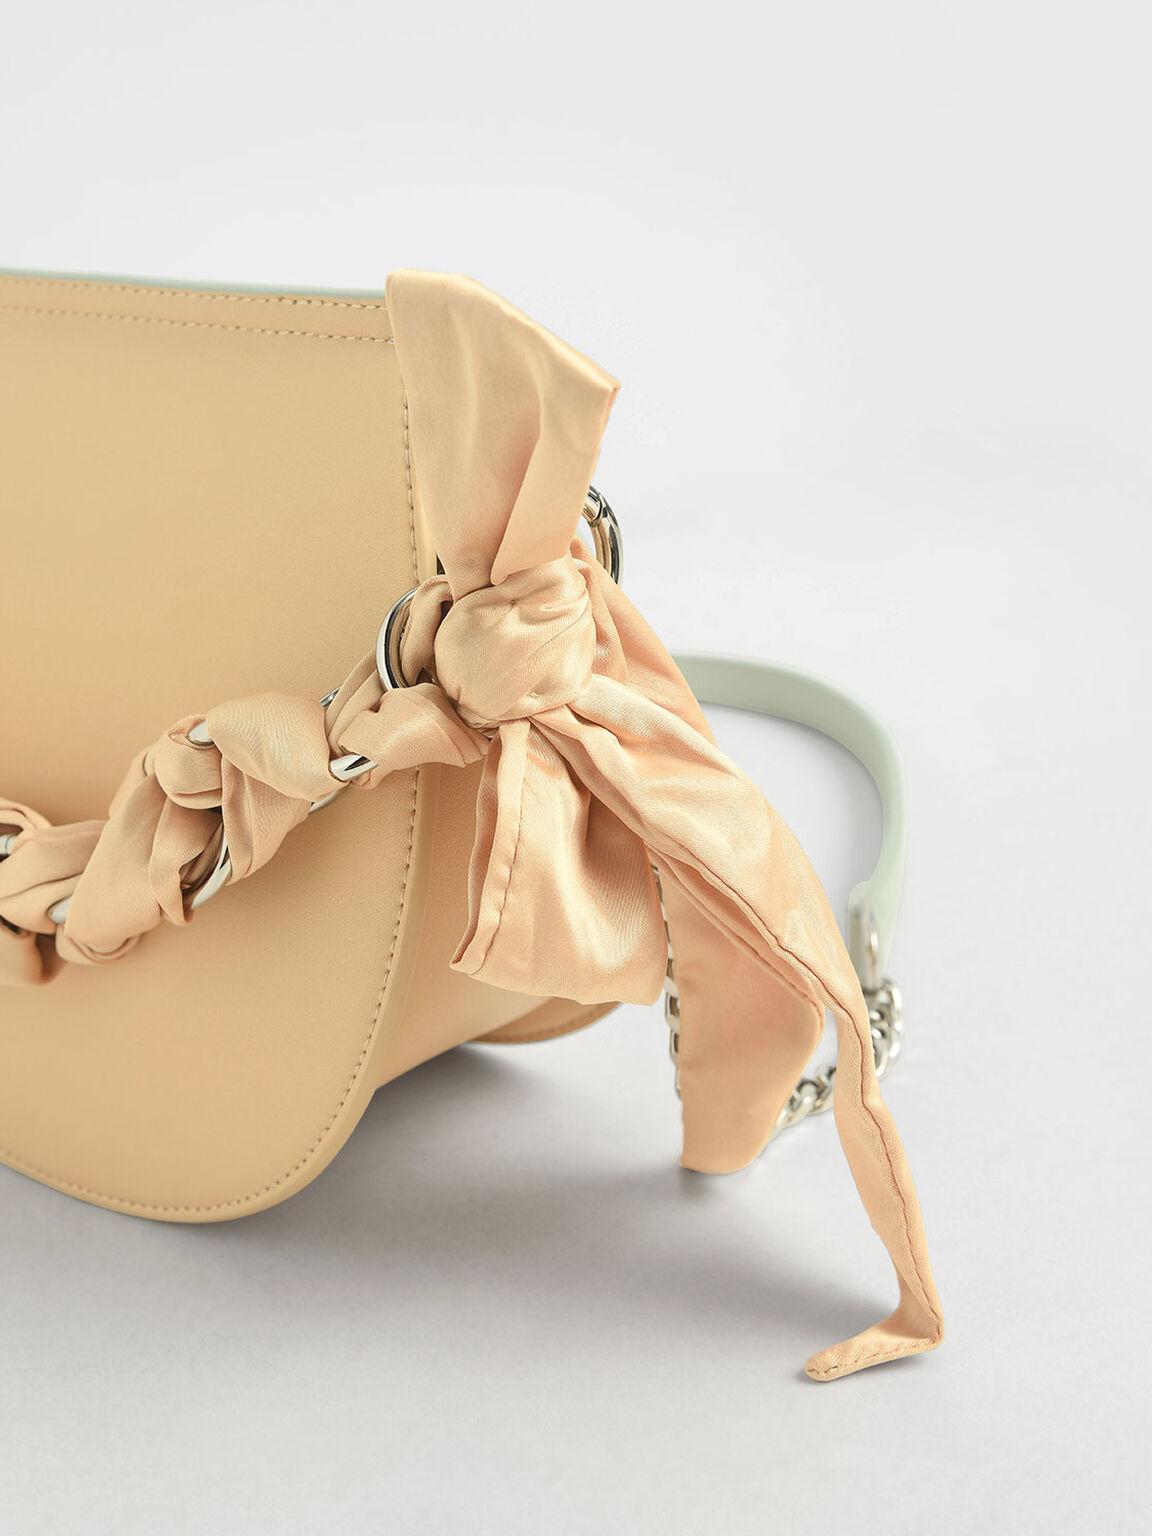 Satin Scarf Semi Circle Bag, Mint Green, hi-res